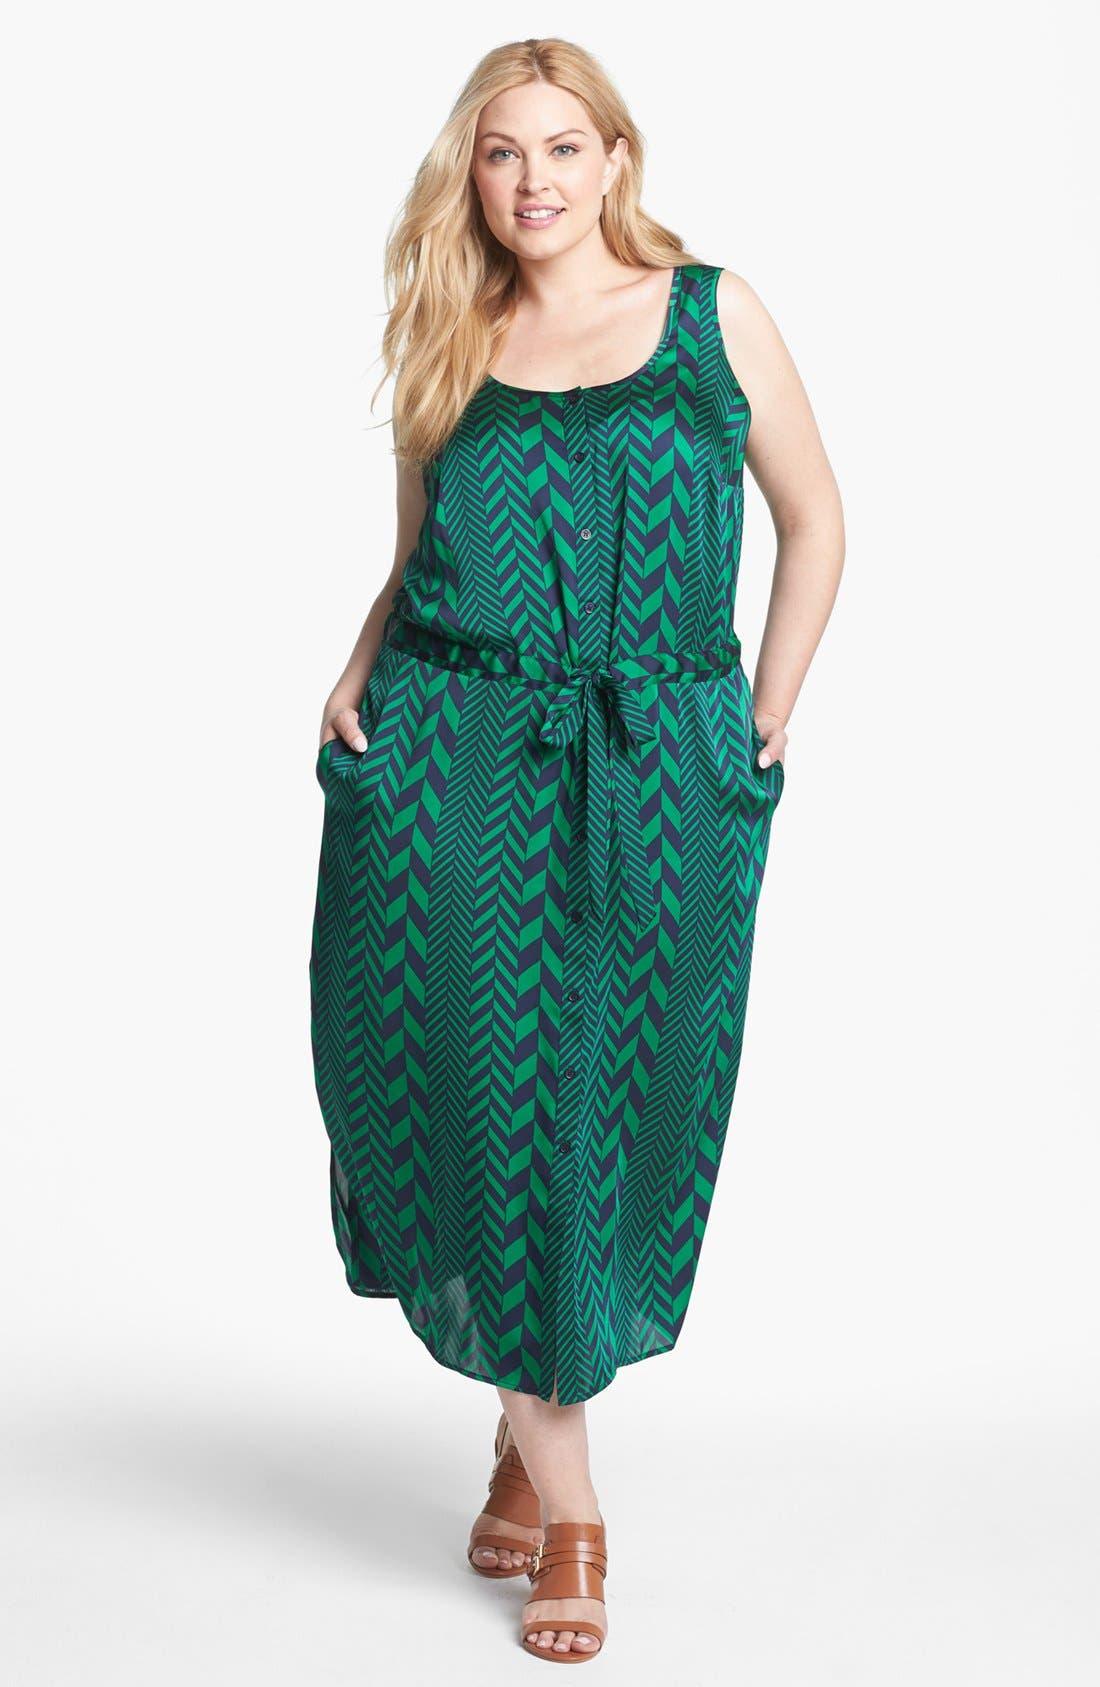 Alternate Image 1 Selected - MICHAEL Michael Kors 'League Stripe' Tank Dress (Plus Size)